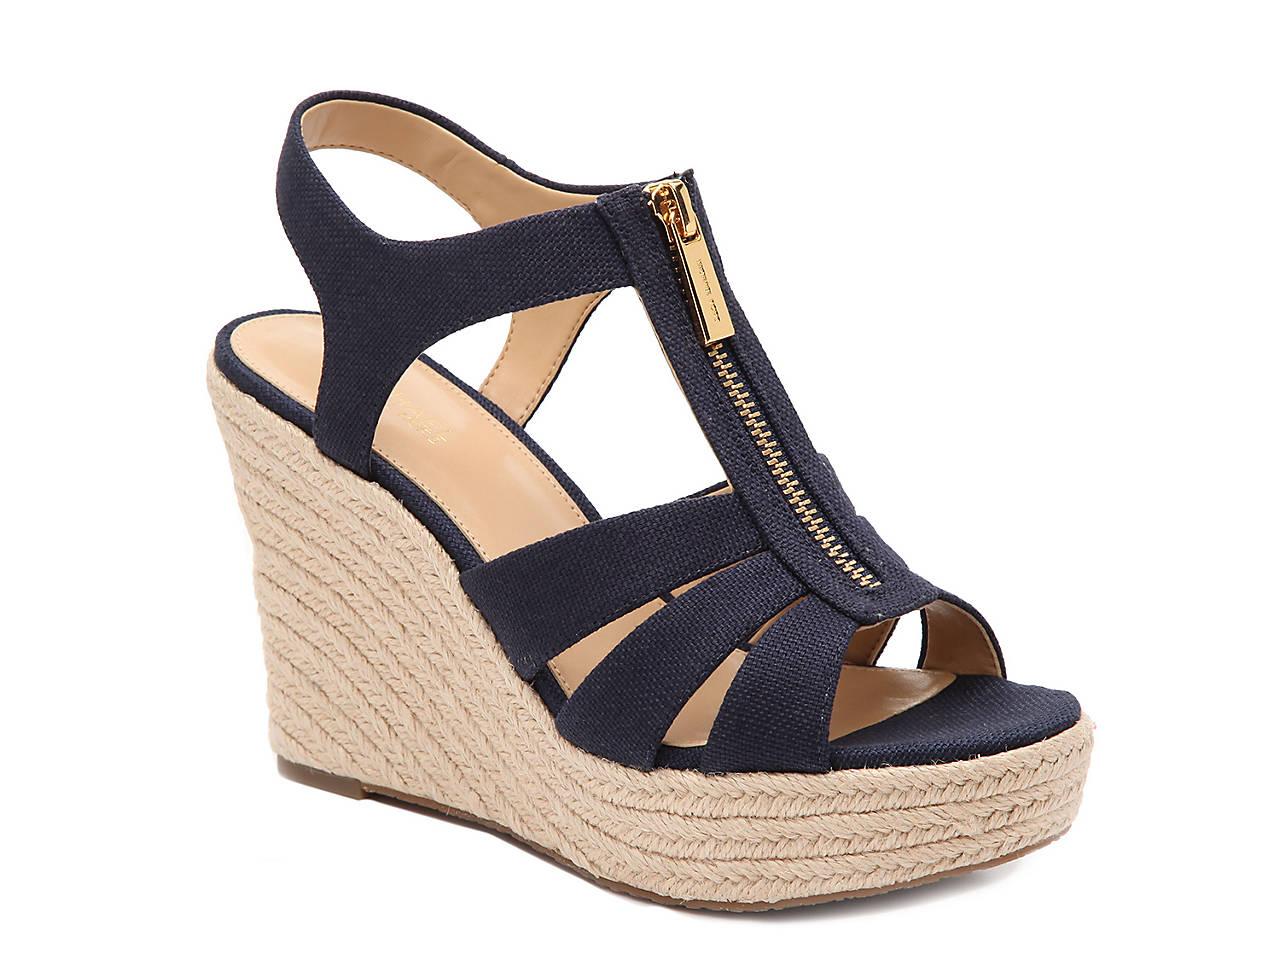 5f107d3e72dc Michael Michael Kors Berkley Espadrille Wedge Sandal Women s Shoes